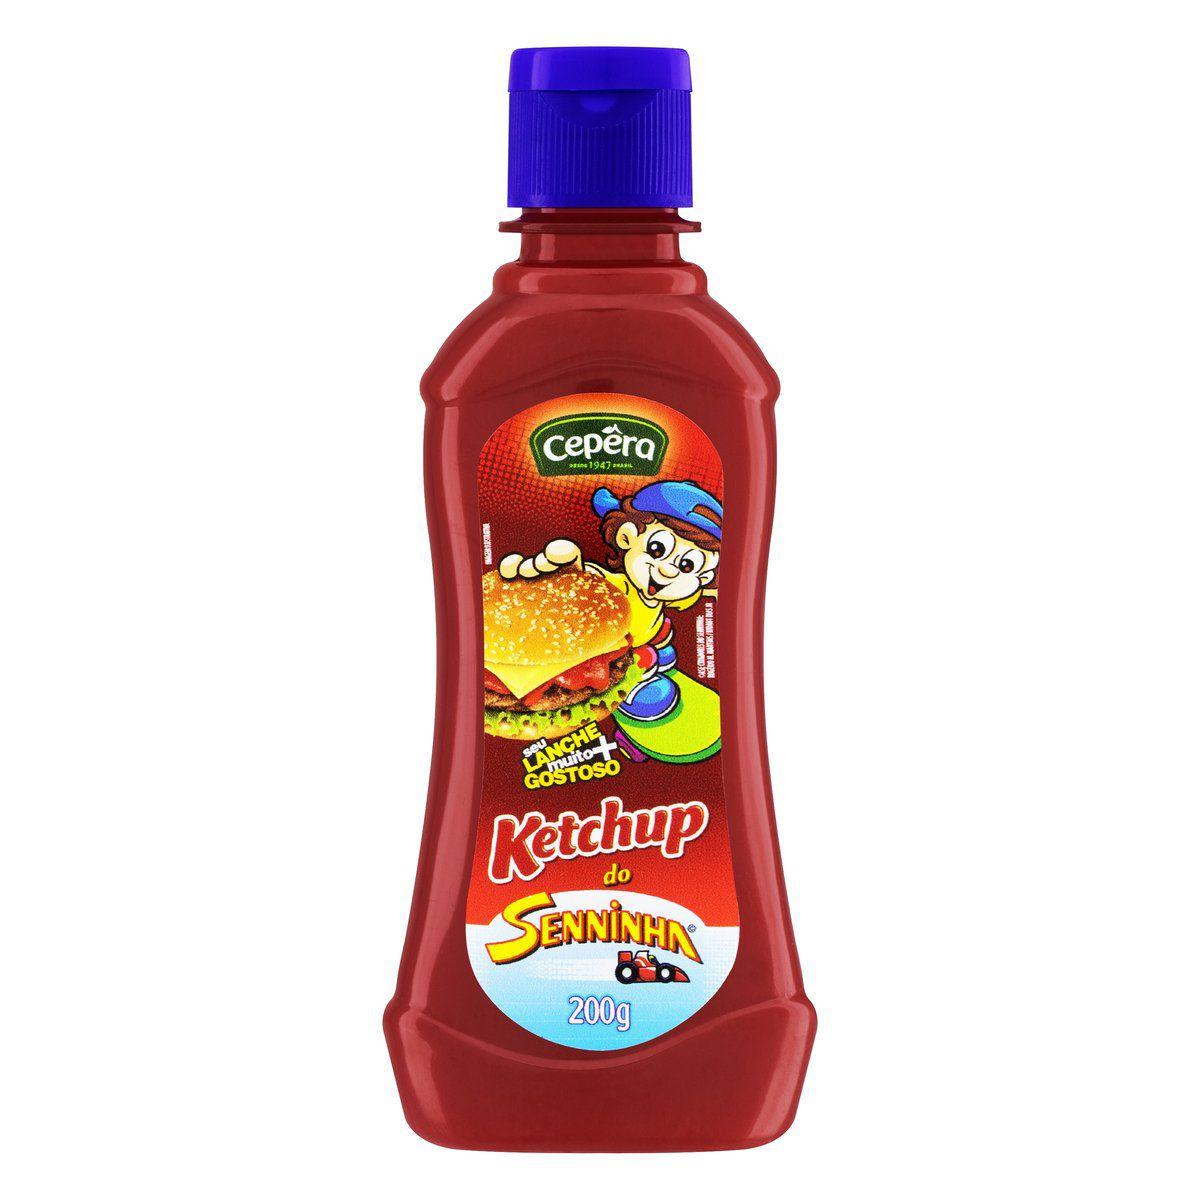 Ketchup Senninha 200g